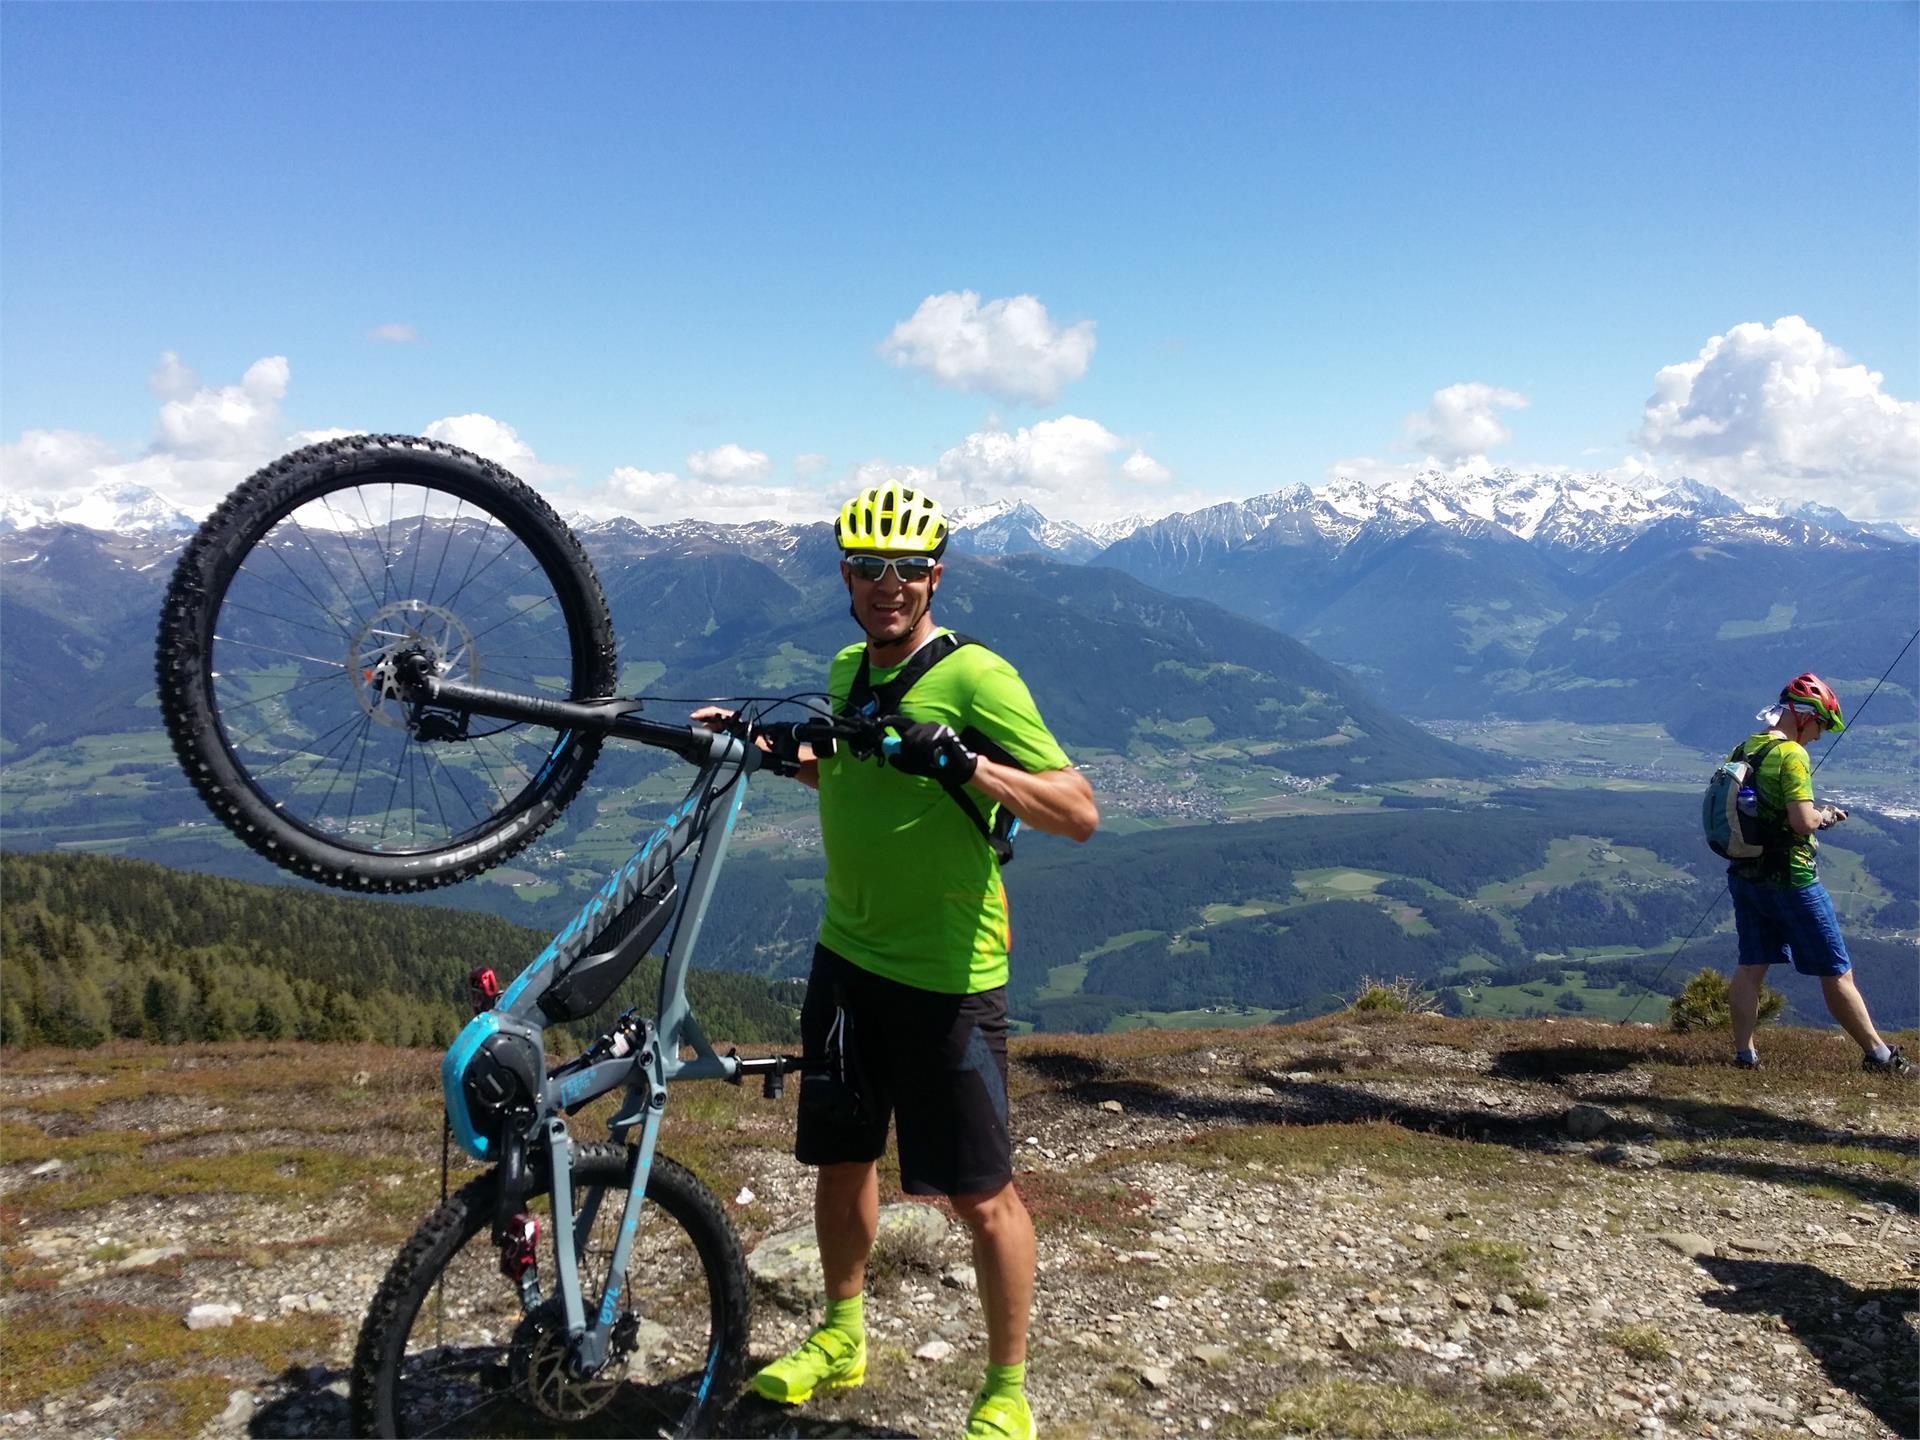 EY-DE-NET Dolomites De Luxe - Skiguide / Bikeguide